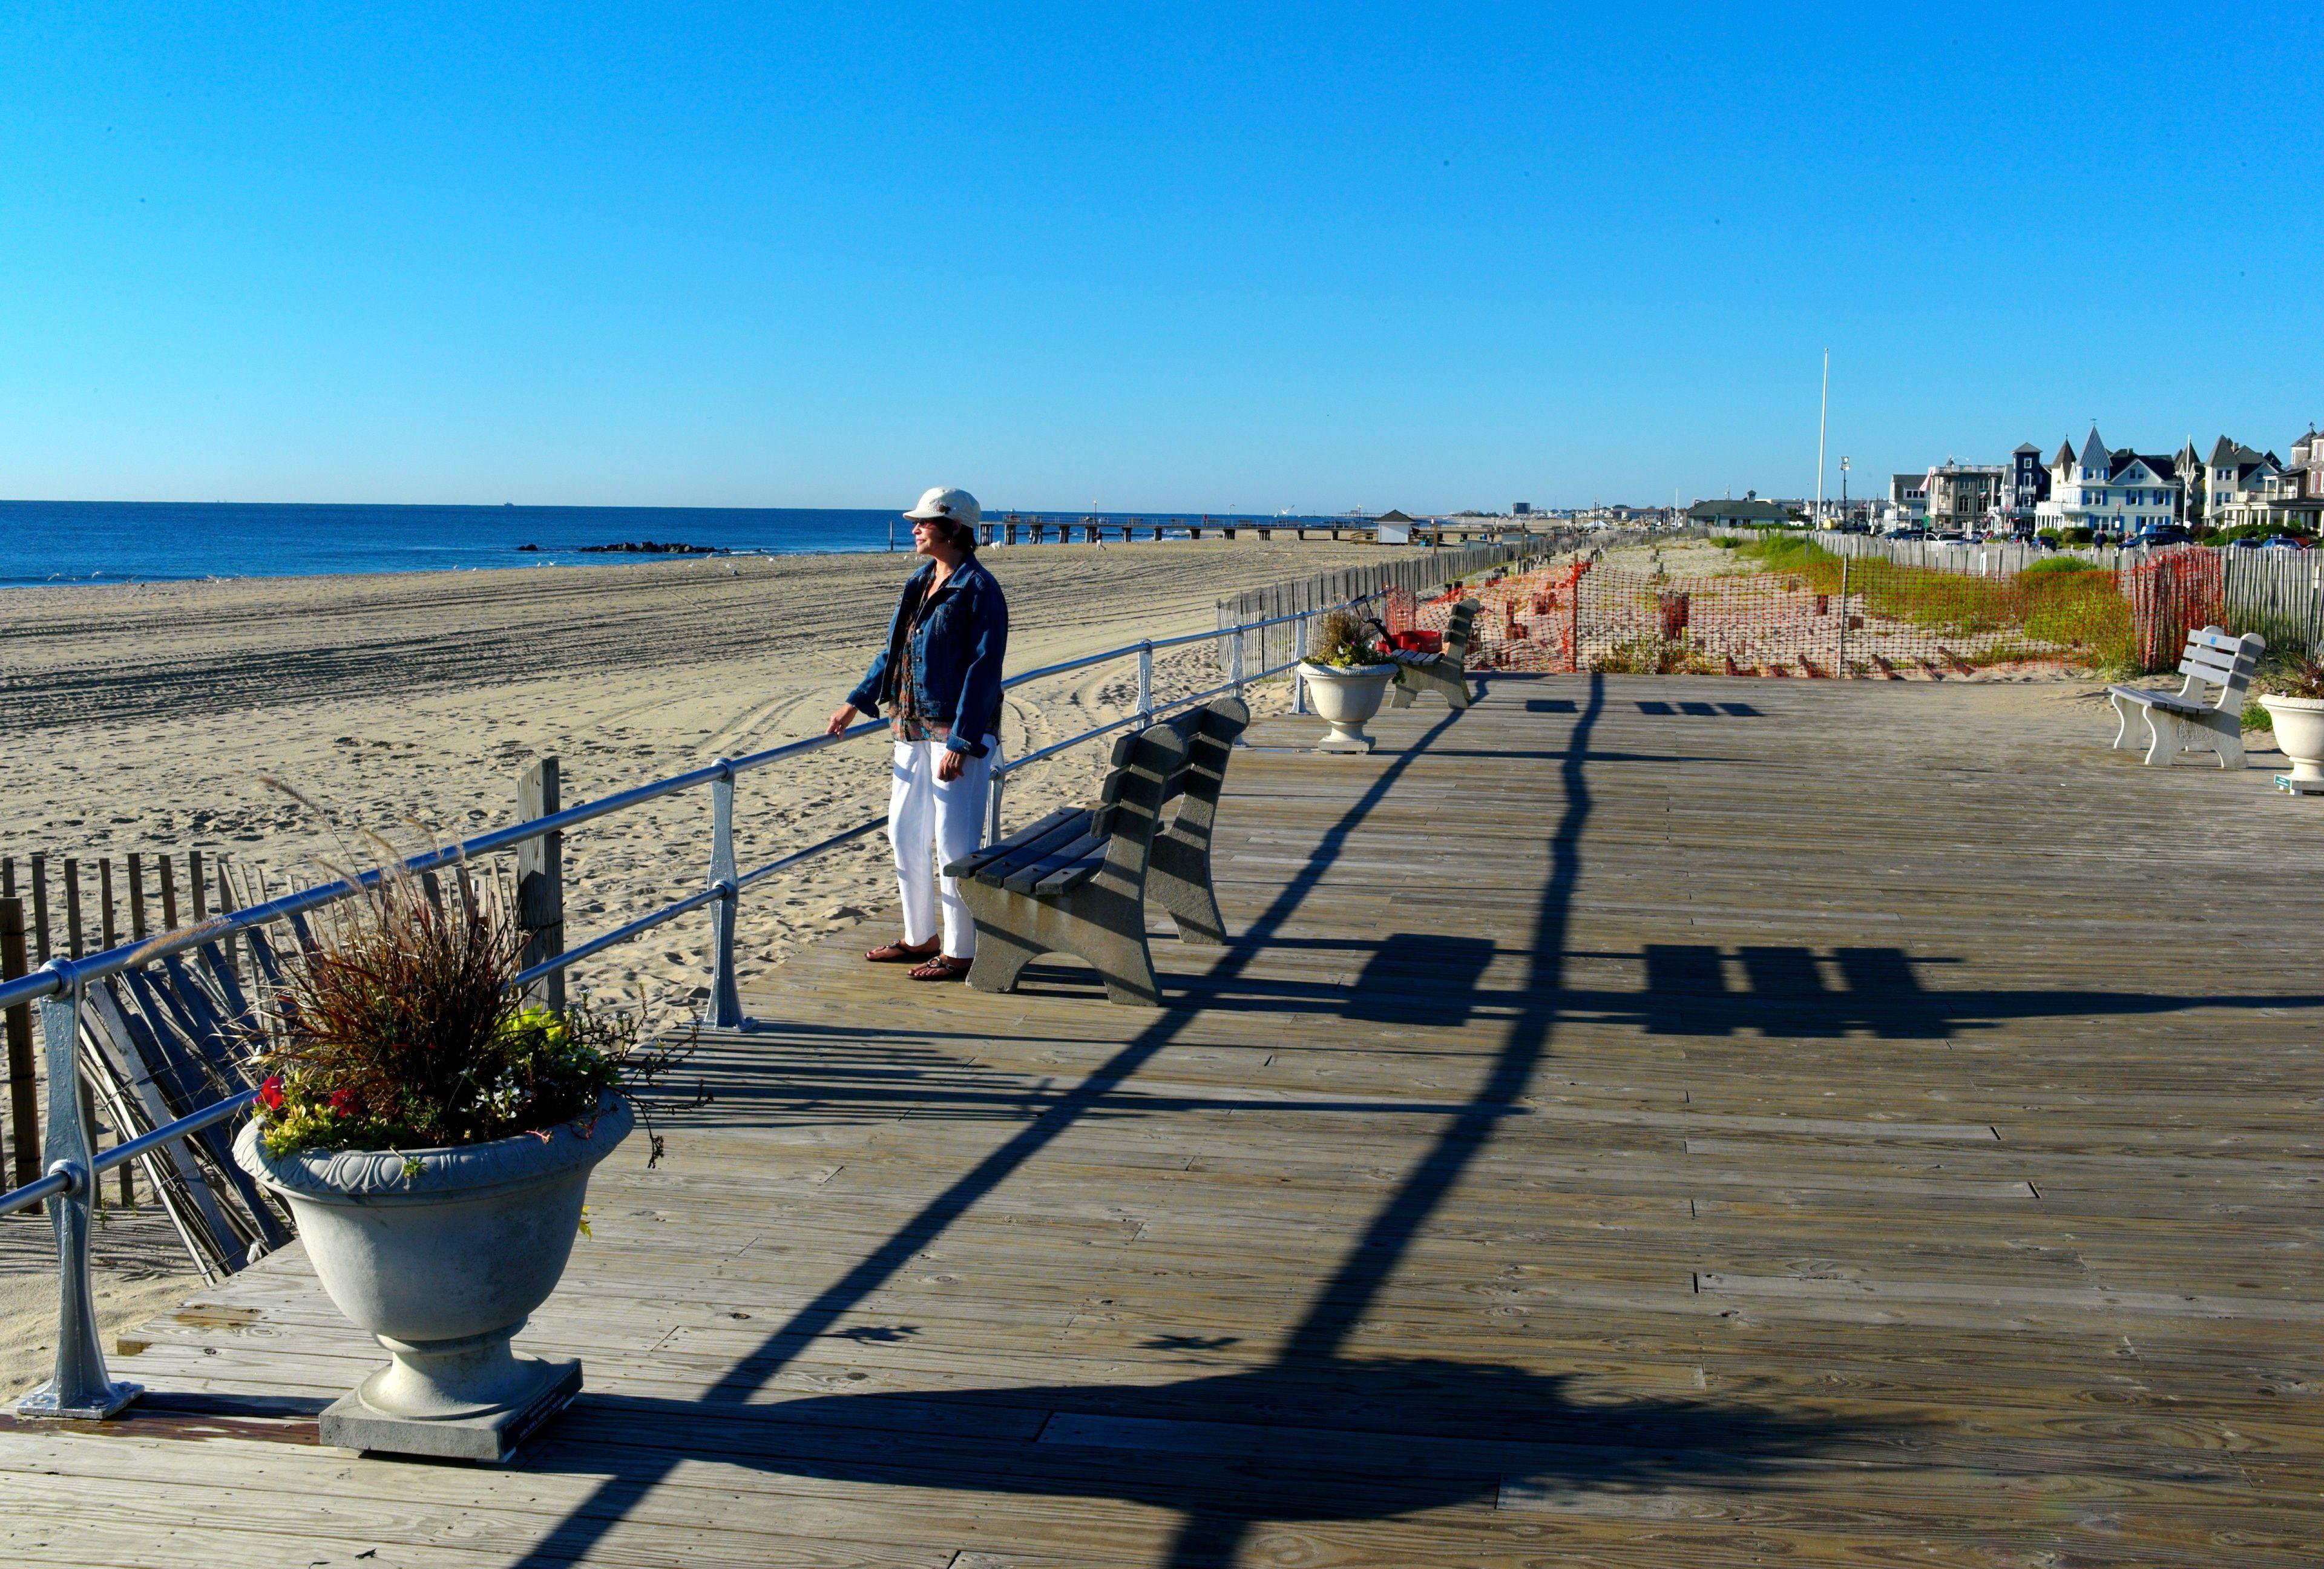 8:30 am. Vicky Redfern of Harrisburg, Pa. surveys the empty Ocean Grove beach.